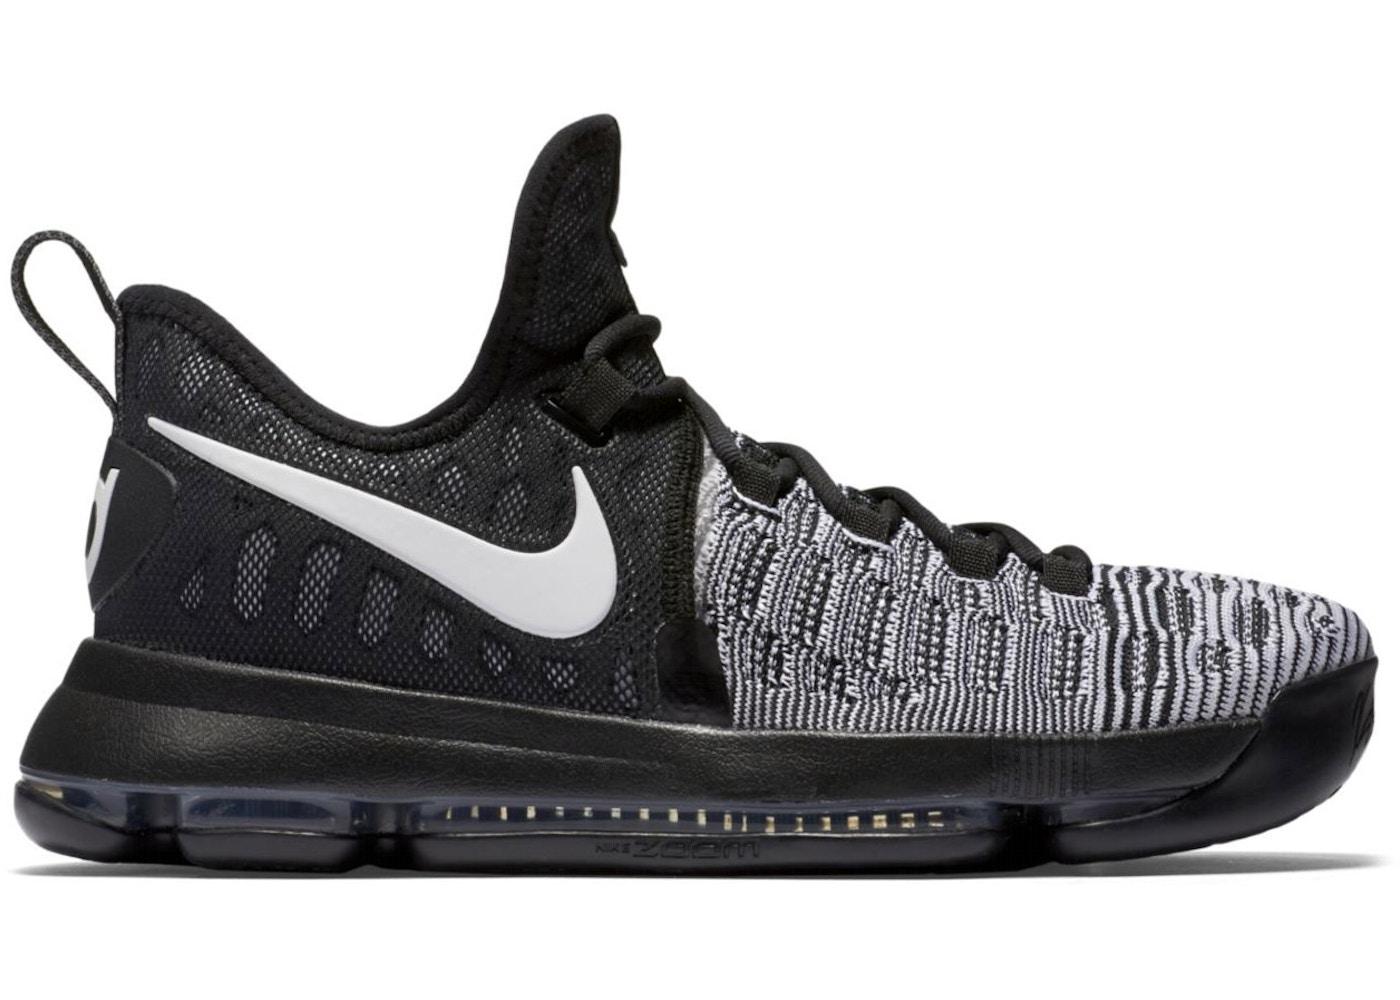 new style 7c636 adcea Buy Nike KD 9 Shoes & Deadstock Sneakers